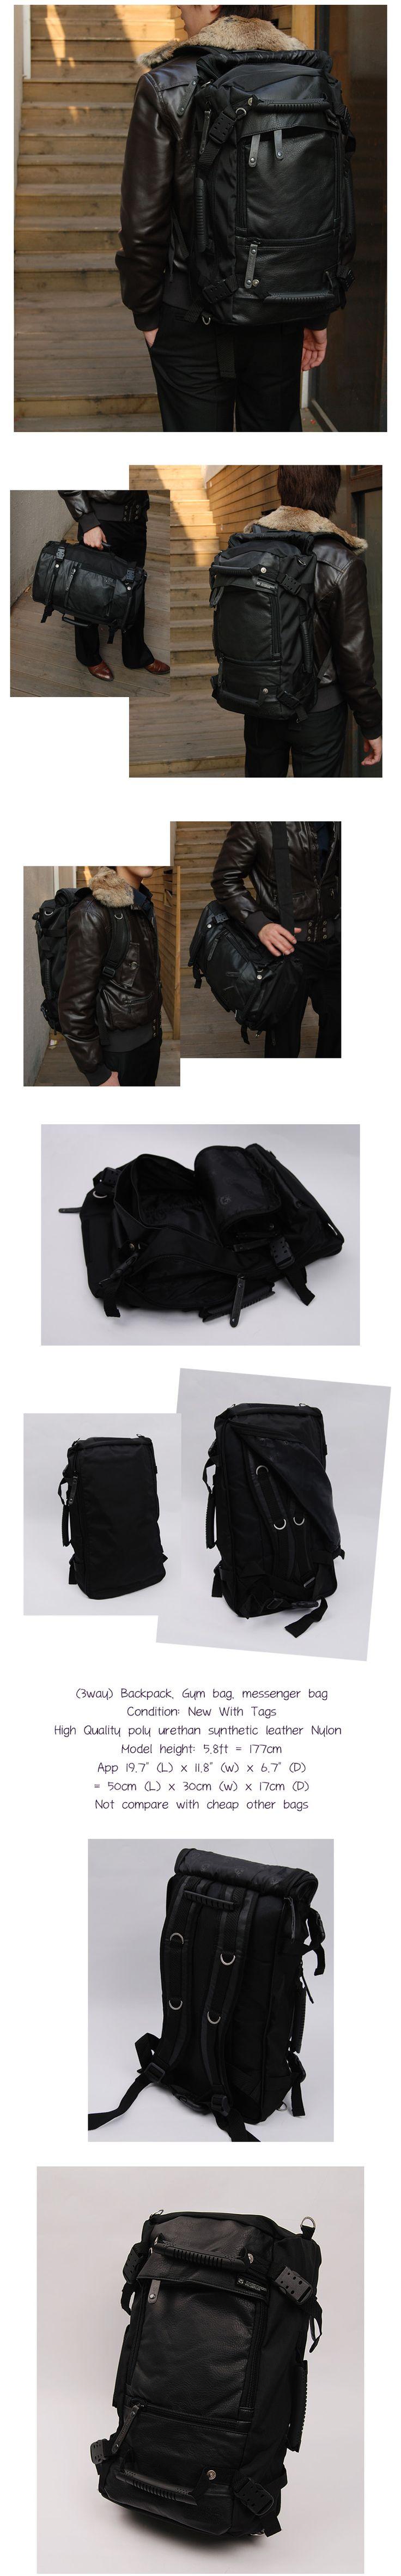 COOL 3way BLACK USEFUL MESSENGER SHOULDER DUFFLE BAGS LAPTOP BACKPACK DAYPACK